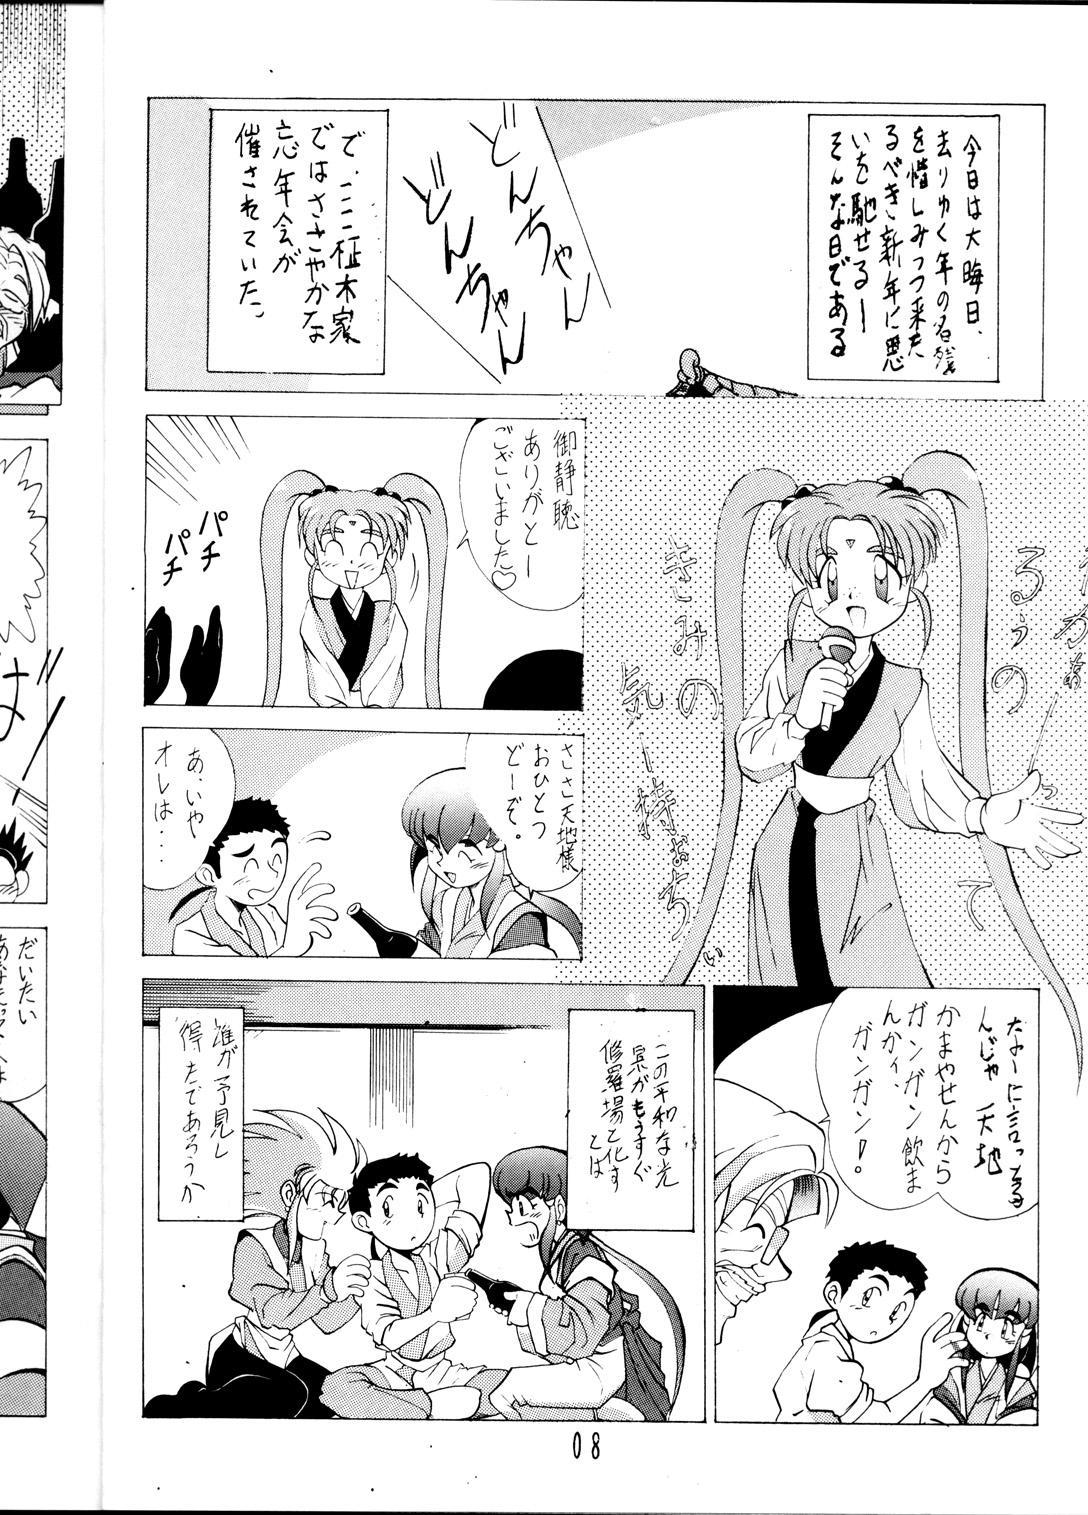 Tenchi Muyou! Sample Vol 6 6